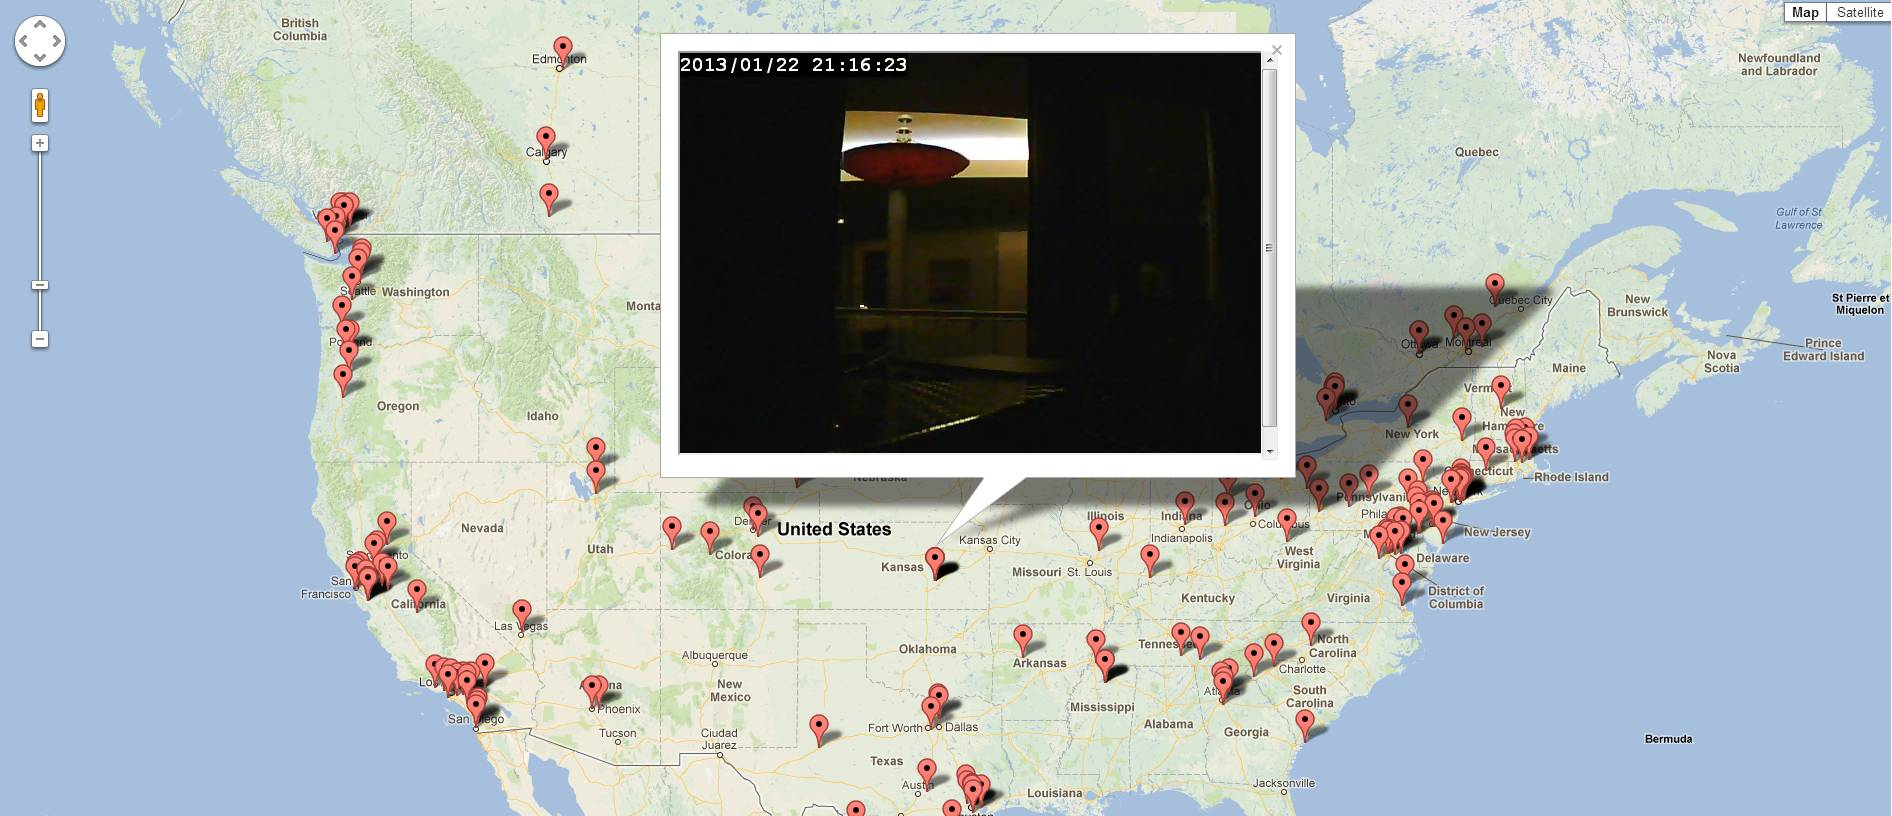 Harta online a camerelor IP nesecurizate!